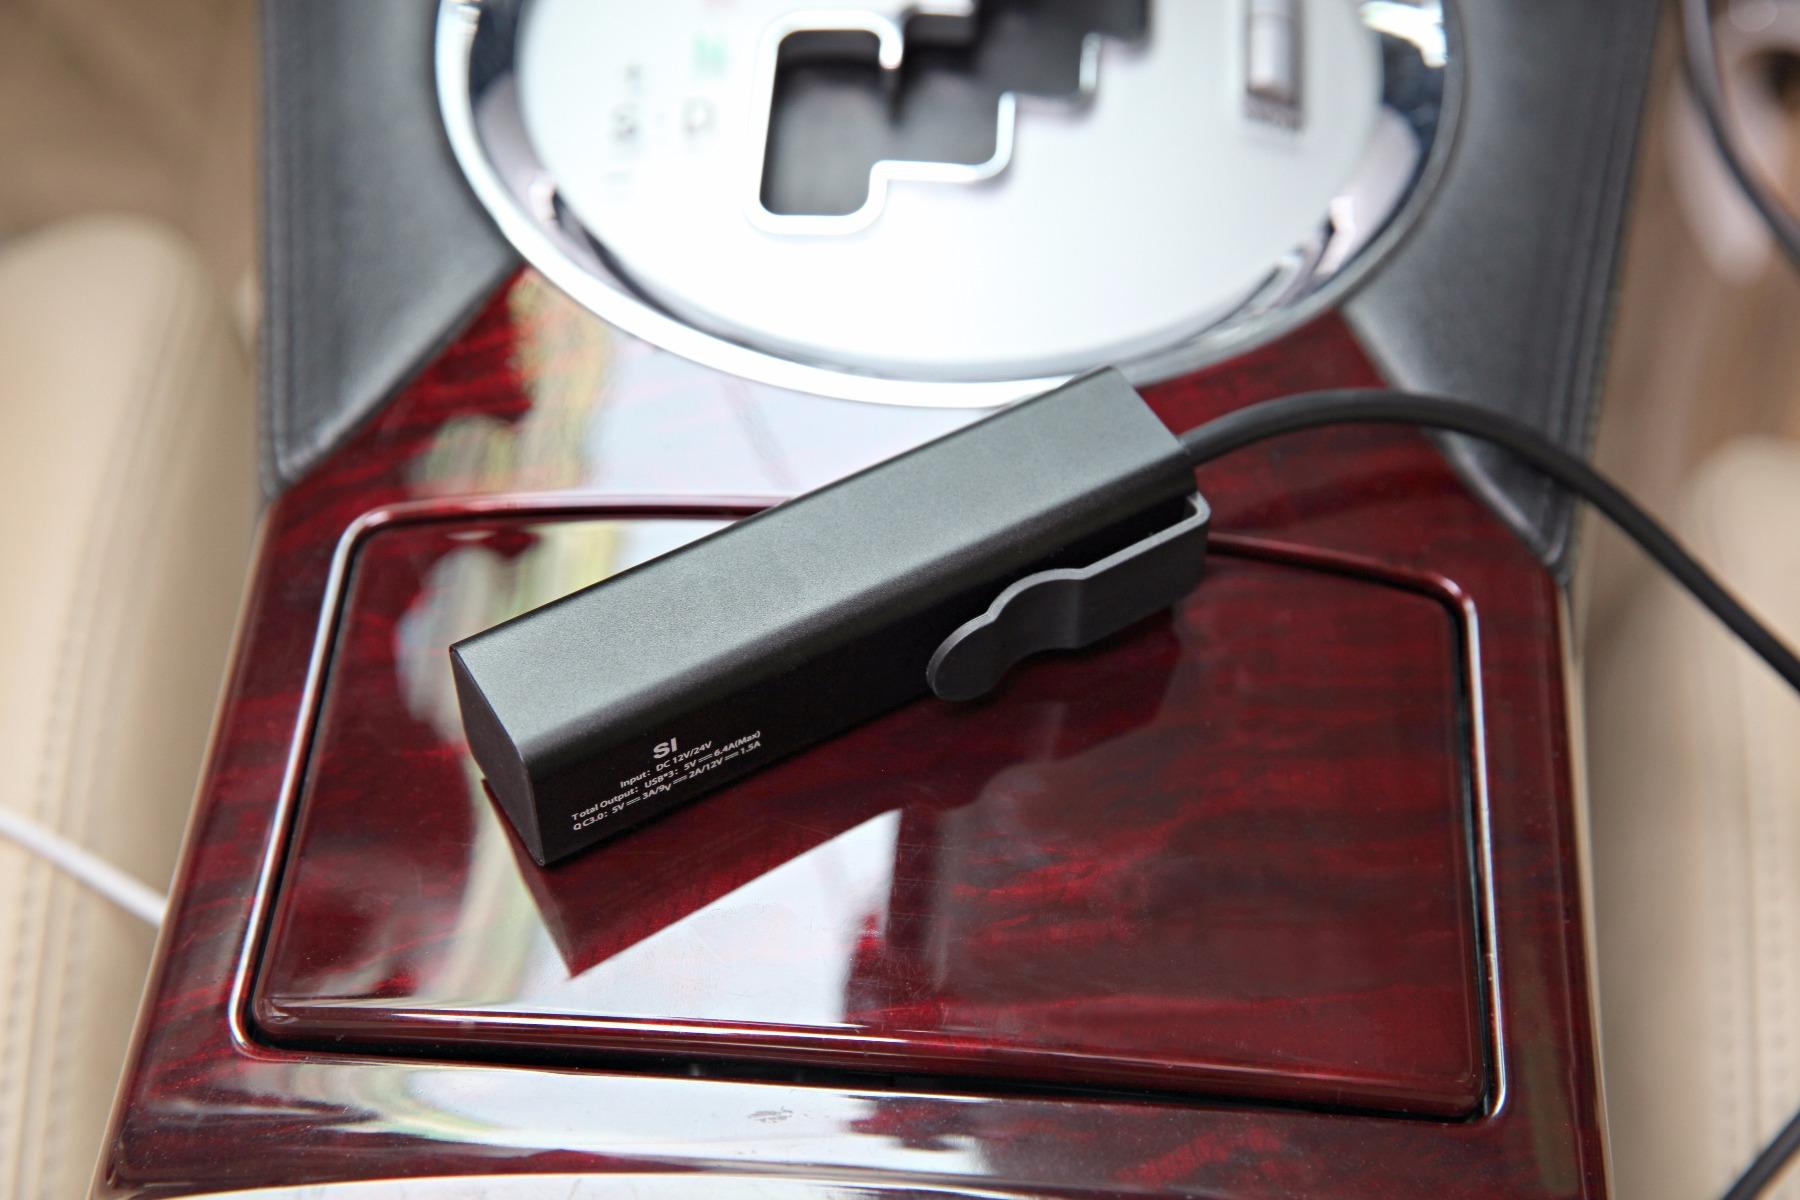 Seenda ICH-31 USB Car Charger with 6 Port